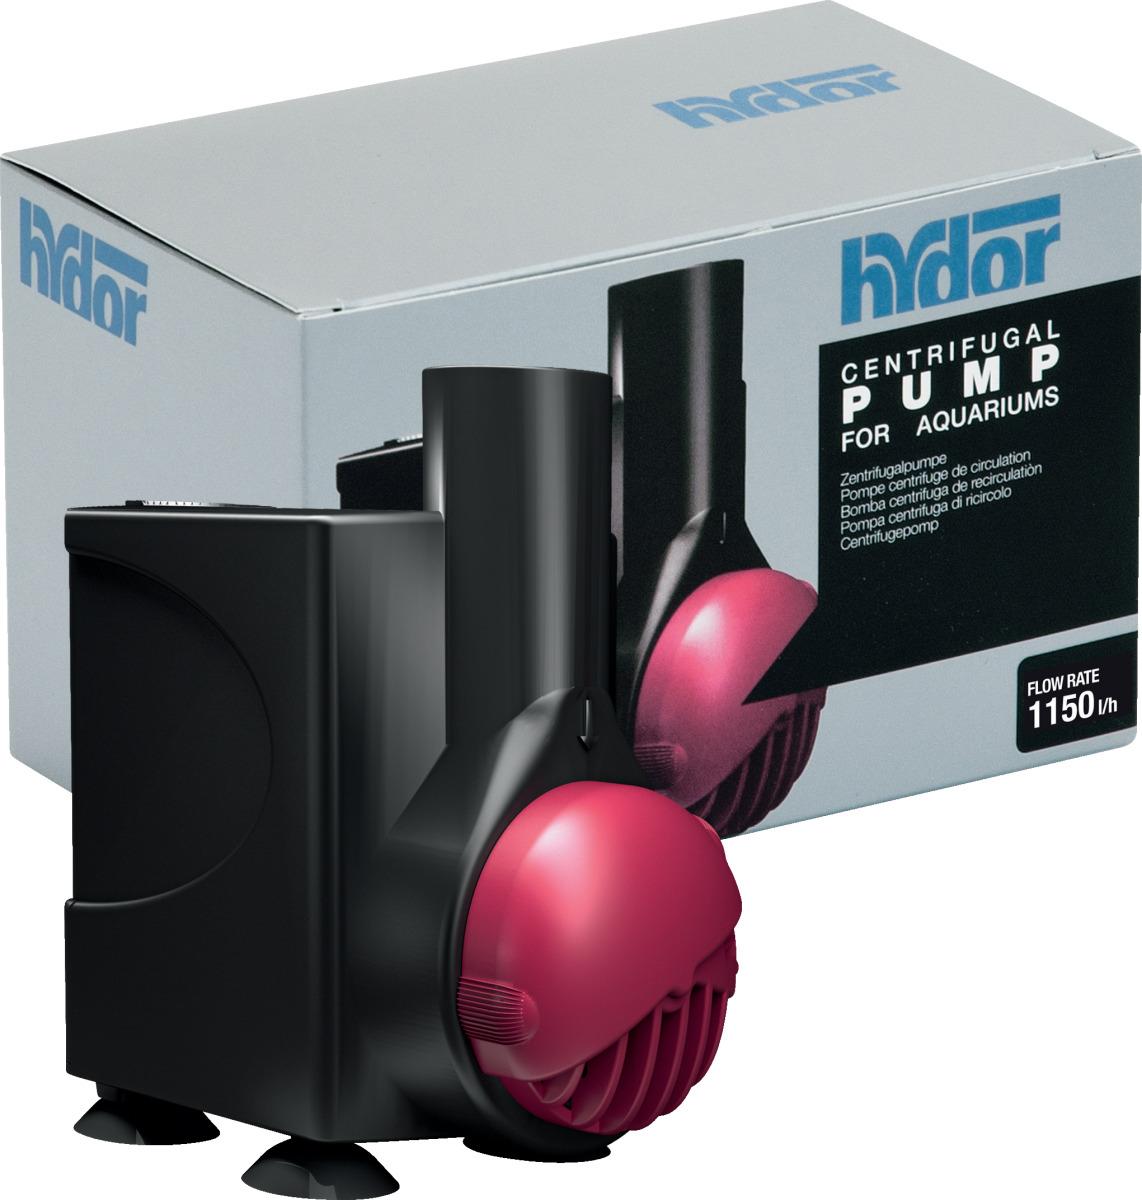 HYDOR Pico 1150 mini pompe universelle 1150 L/h pour aquarium